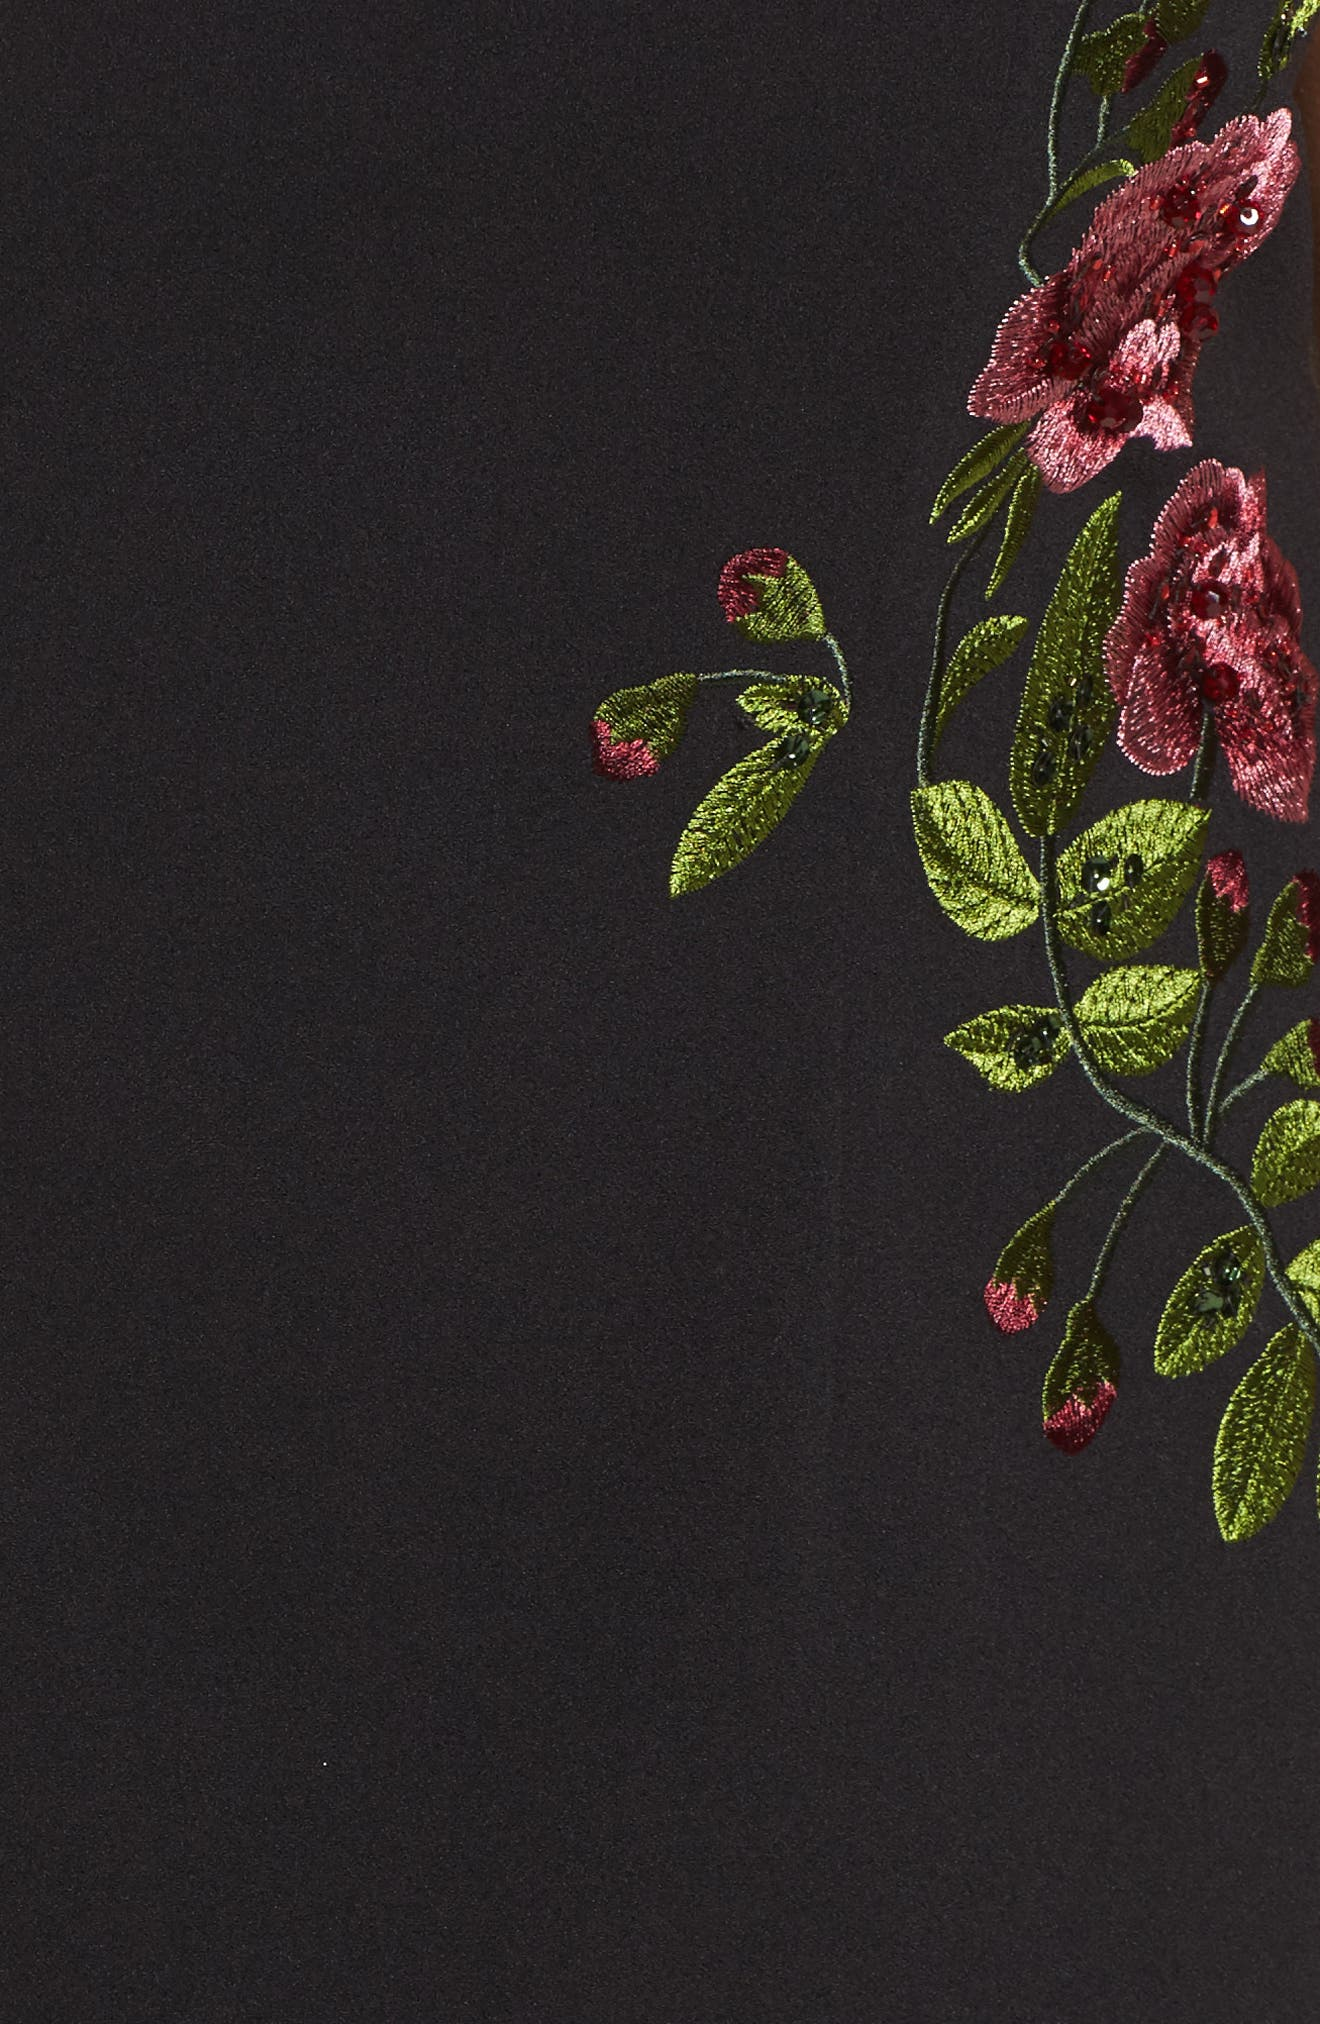 Flower Embroidered Crepe Sheath Dress,                             Alternate thumbnail 5, color,                             Black Multi